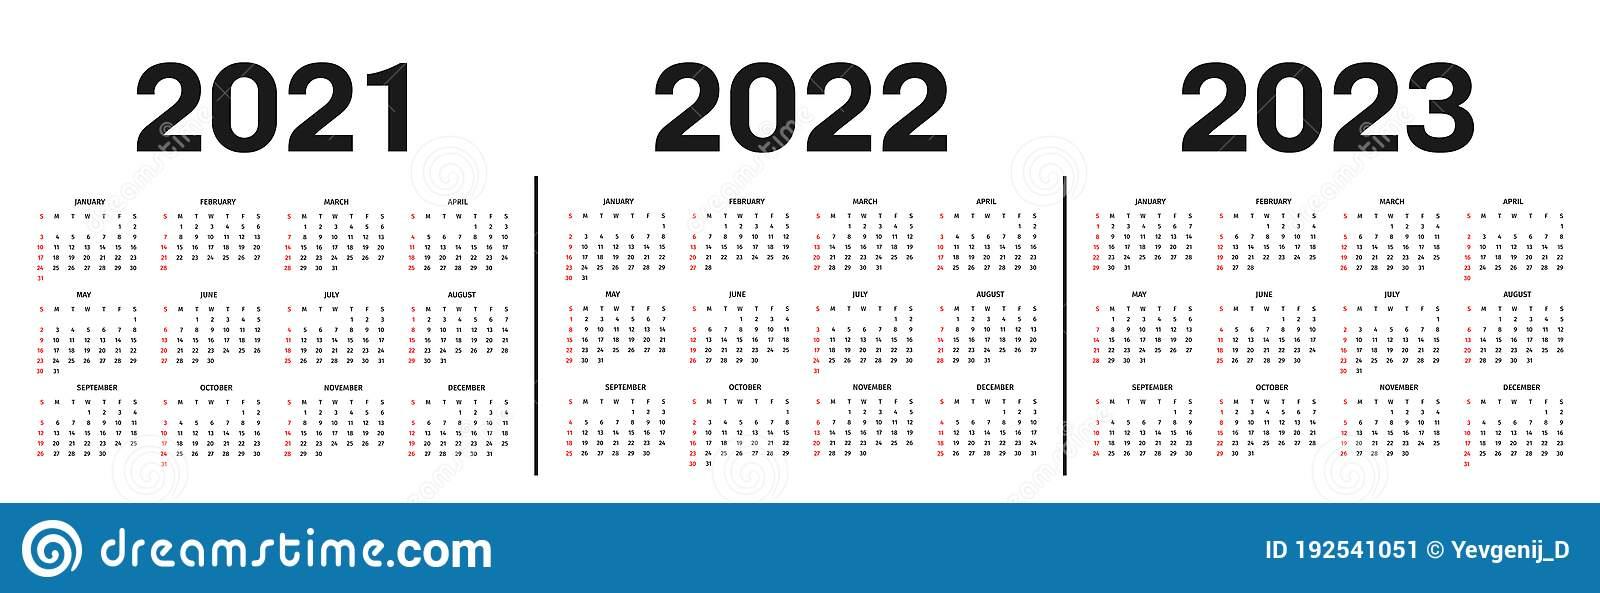 Calendar 2021, 2022 And 2023 Template. Calendar Template with 4 5 4 Retail Calendar 2022 2023